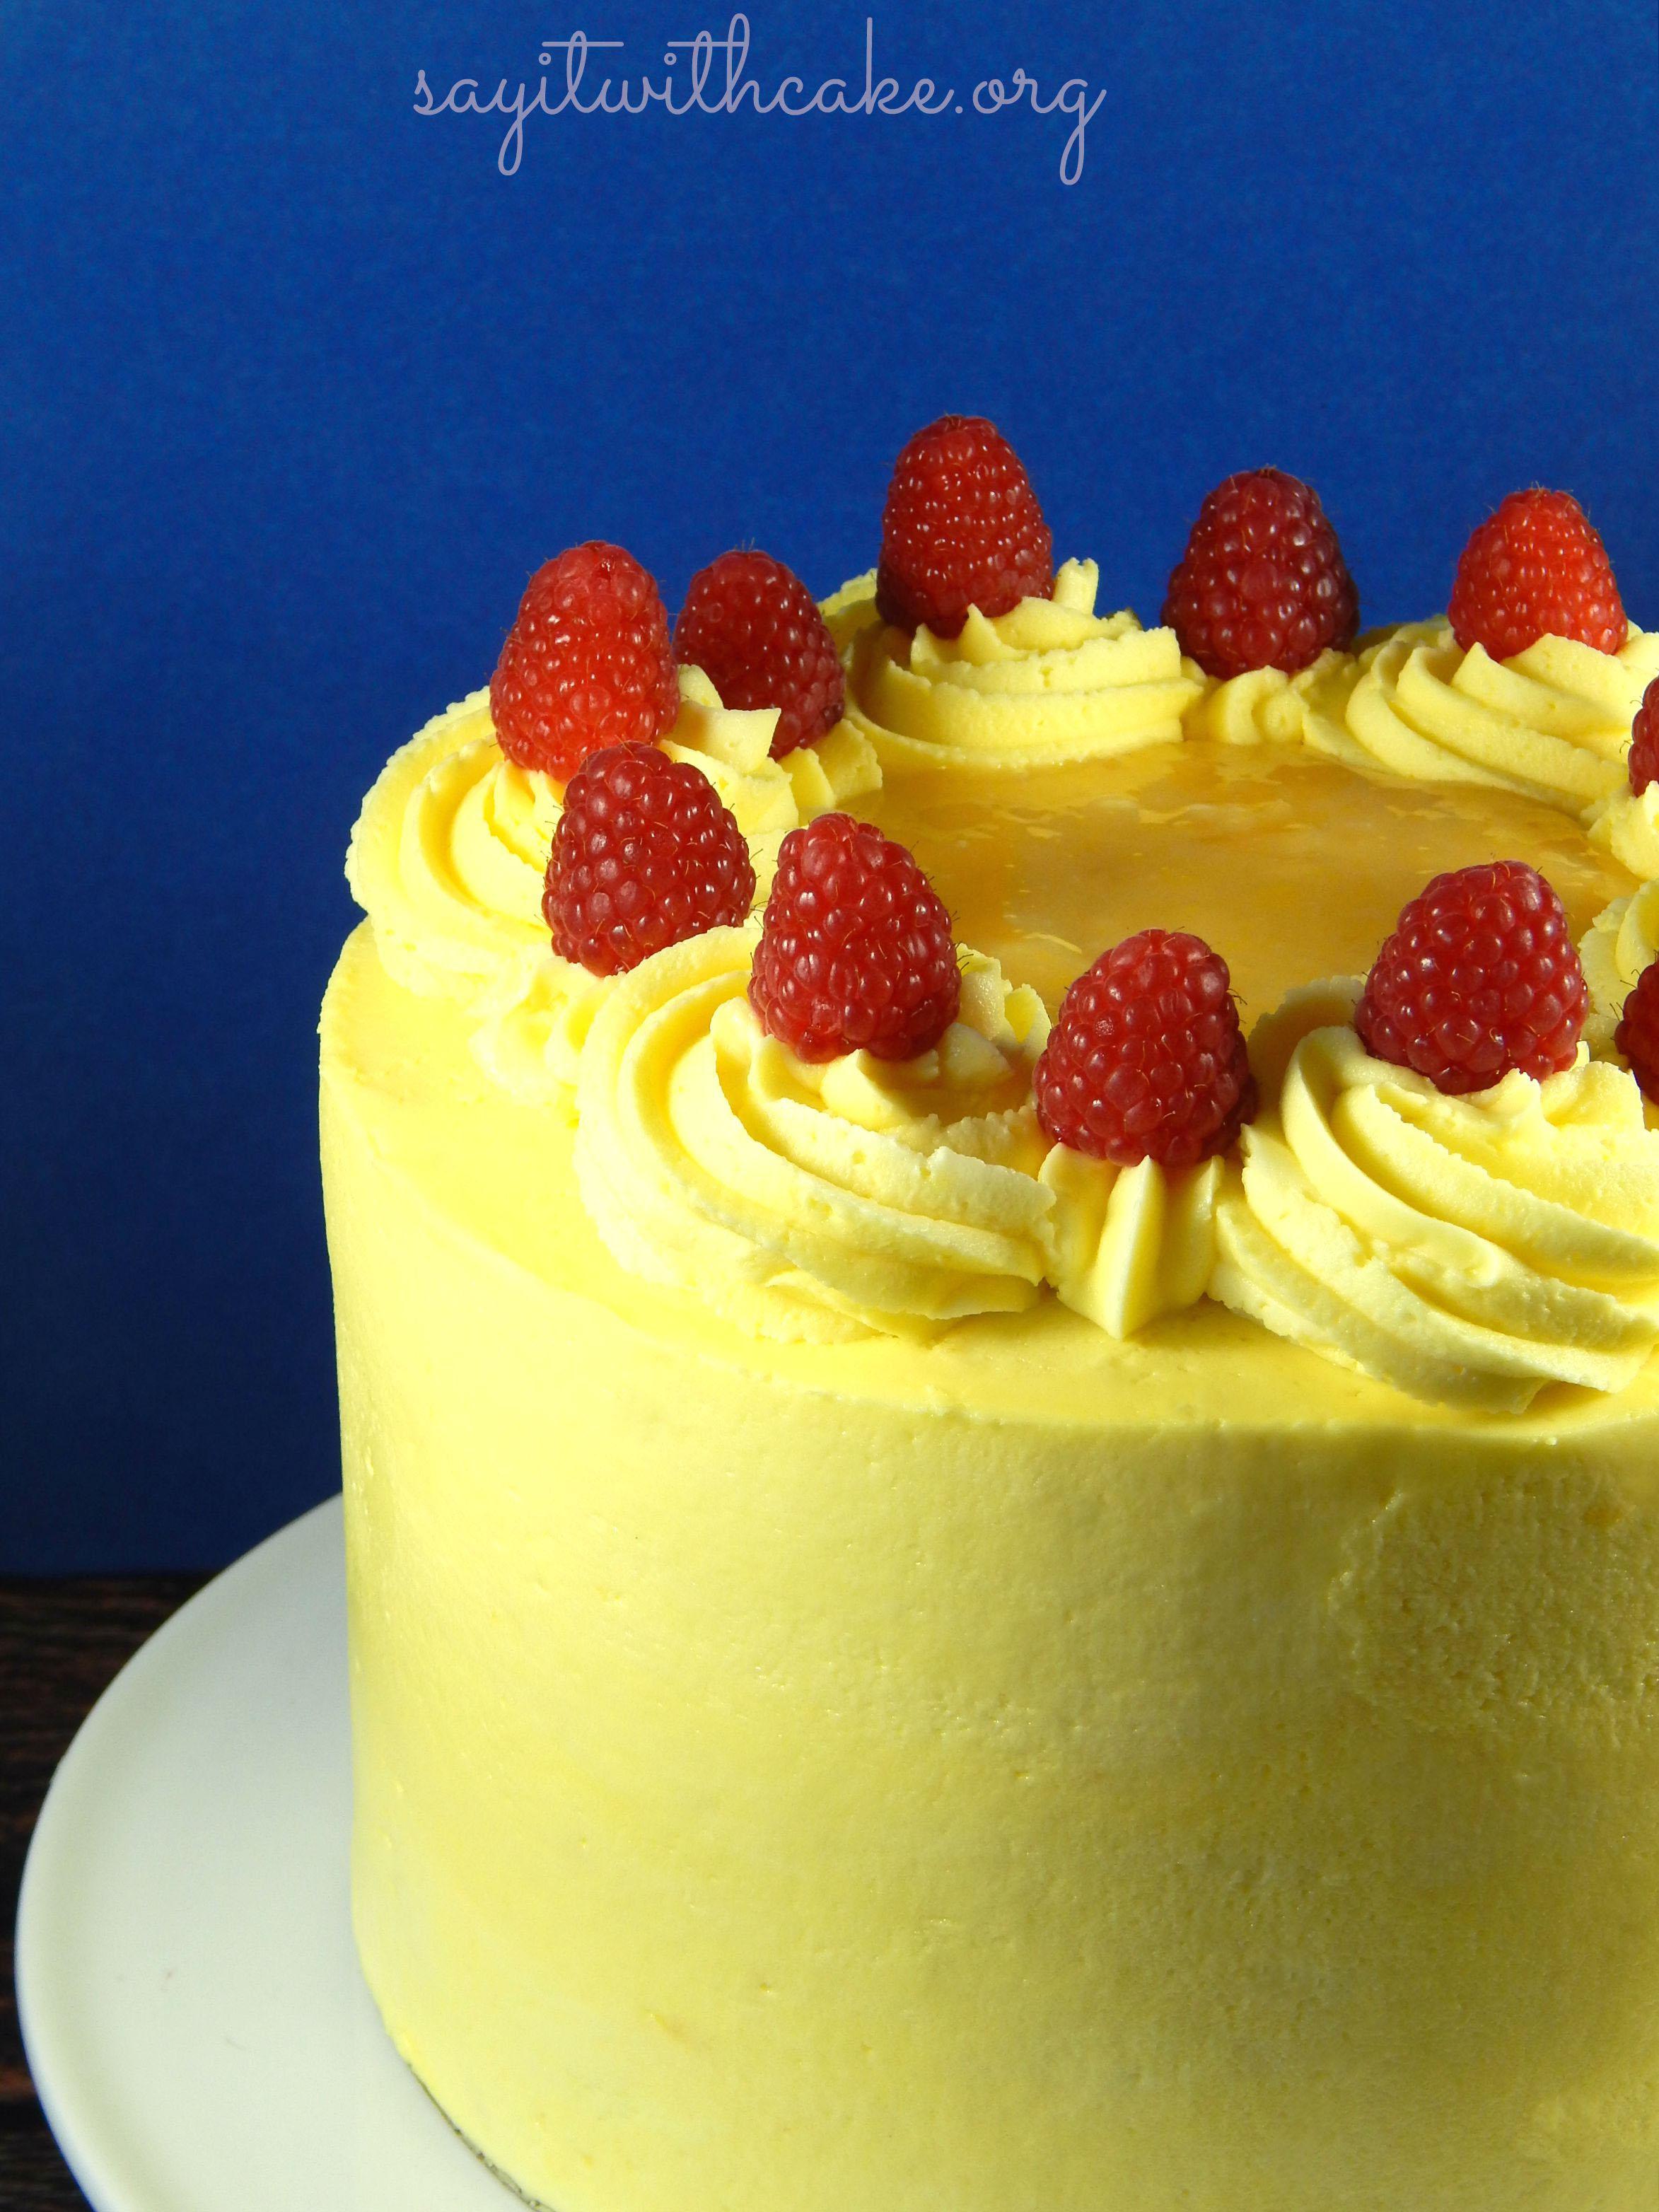 Wasc Lemon Cake With Fresh Raspberry Filling Jul17 Raspberrycake1